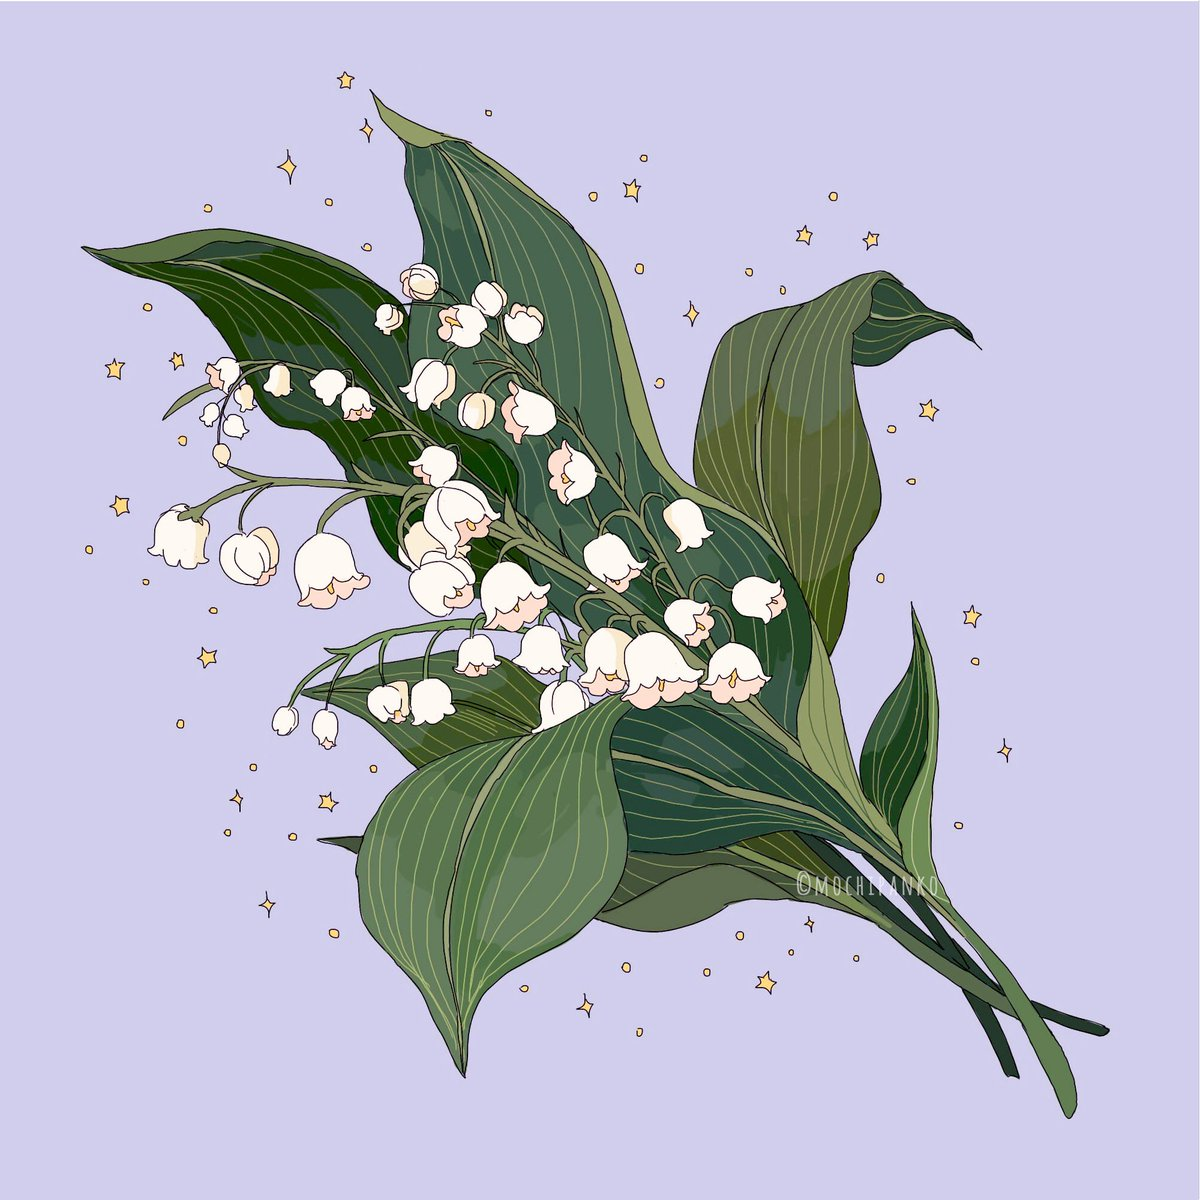 Liya on twitter r e f l o r e s c e r e flower zine liya on twitter r e f l o r e s c e r e flower zine flower set no 5 white egret orchid habenaria radiata lily of the valley convallaria izmirmasajfo